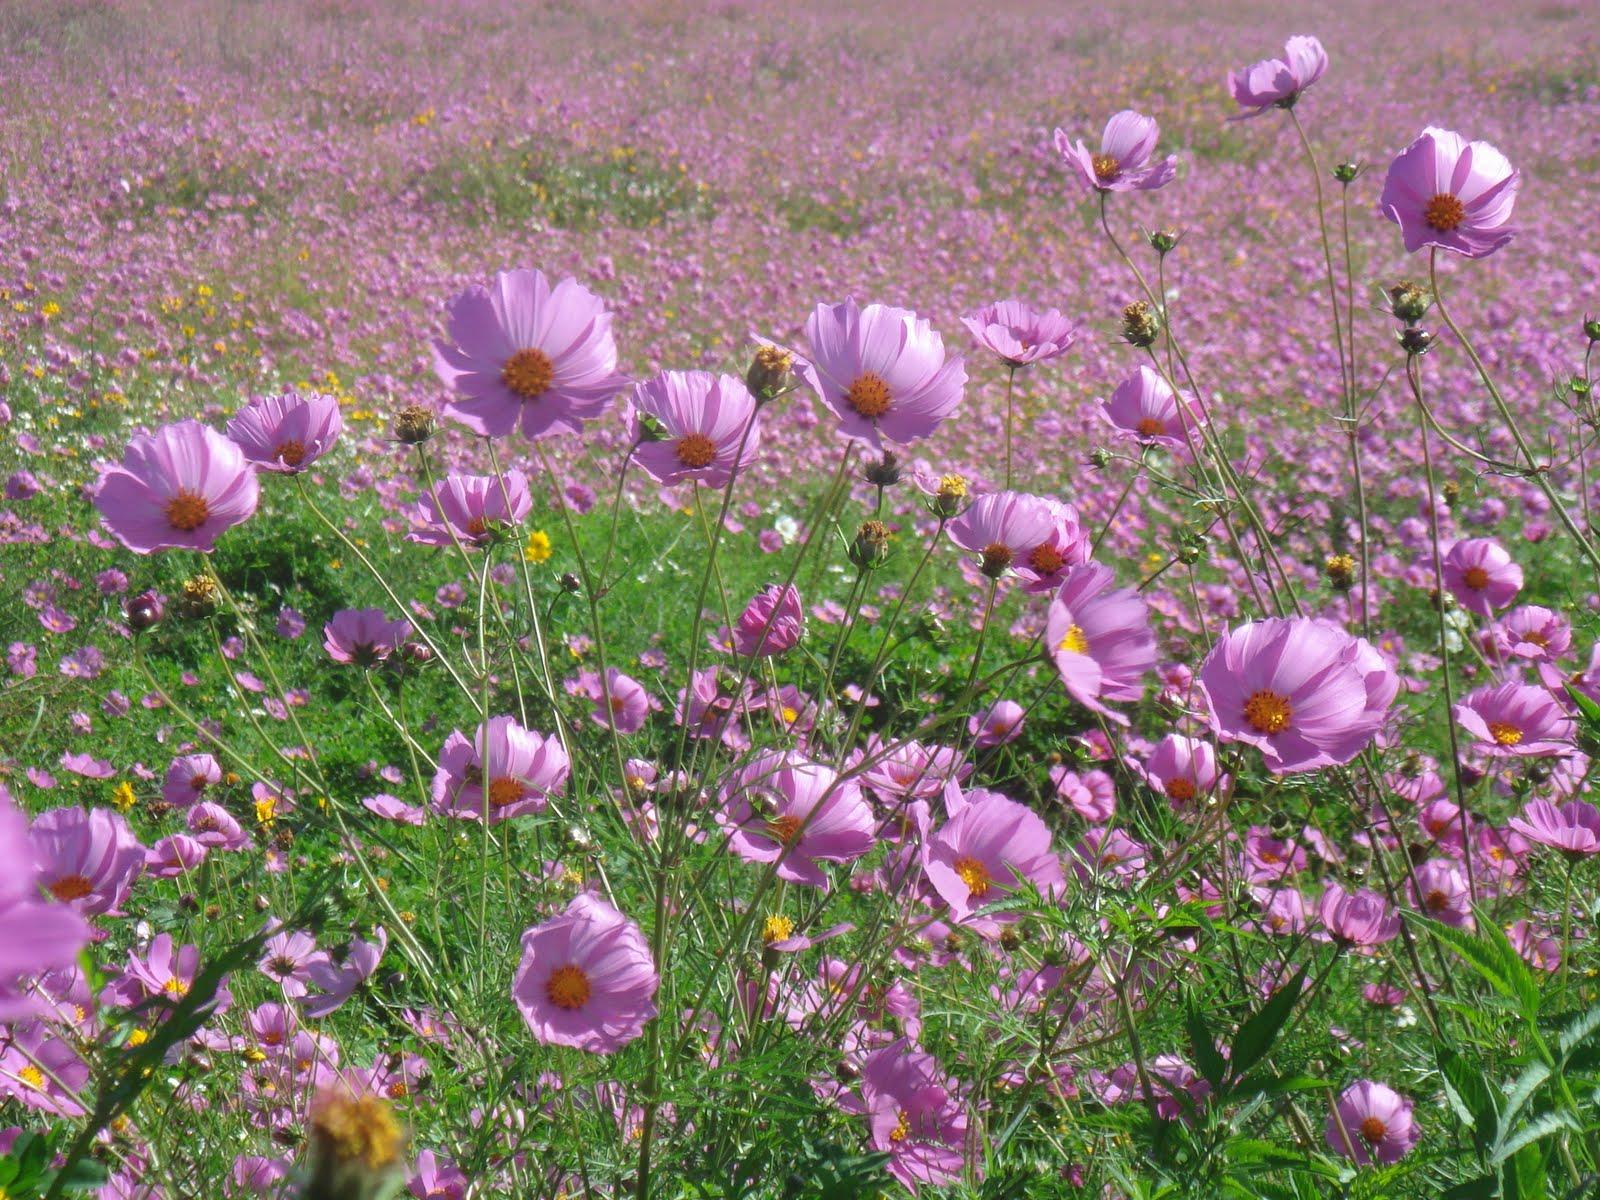 Imagenes De Rosas Silvestres